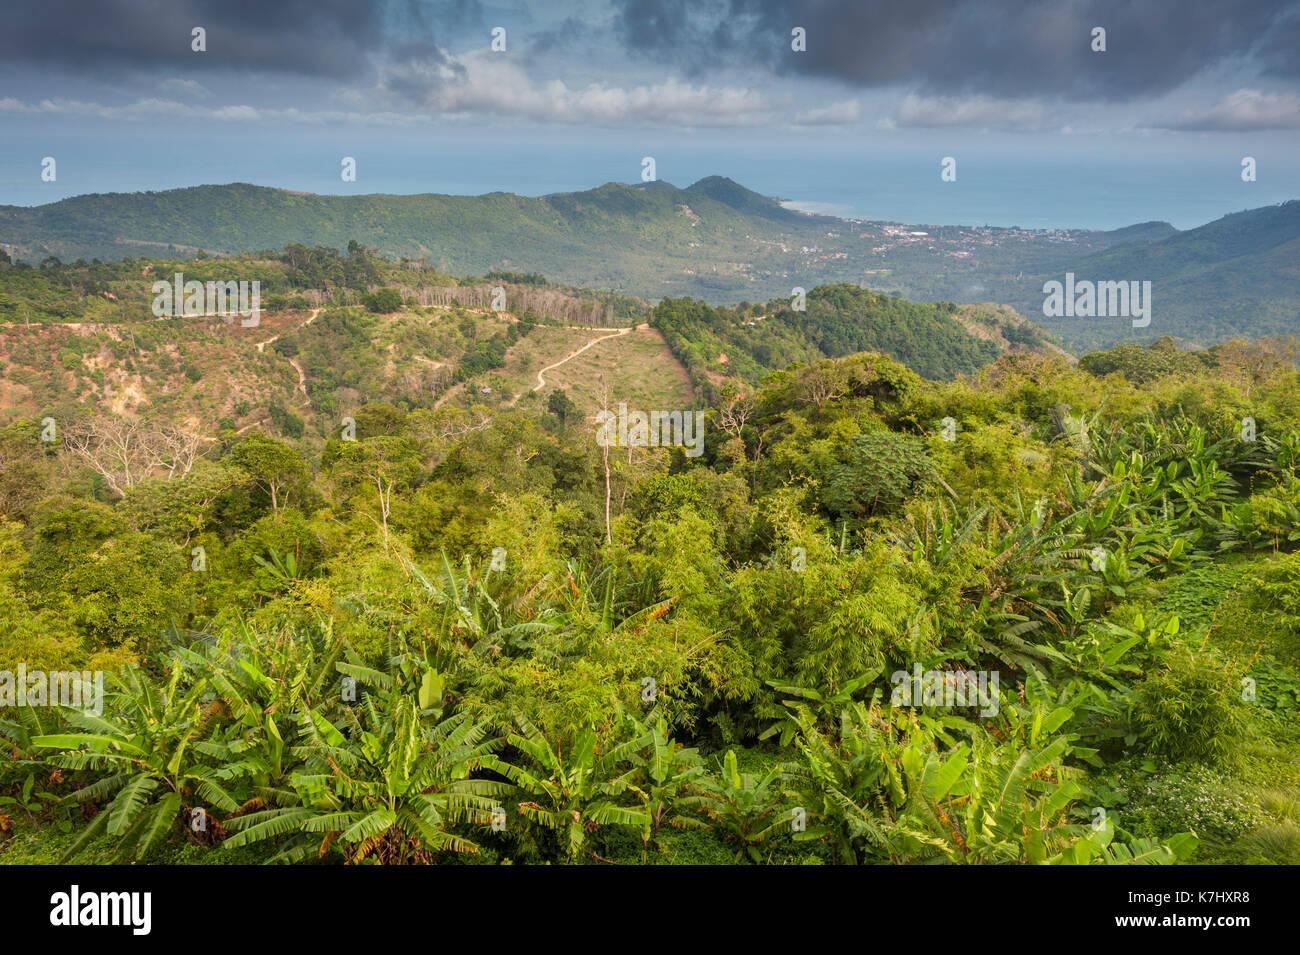 Blick auf die Insel Koh Samui, Thailand. Stockbild